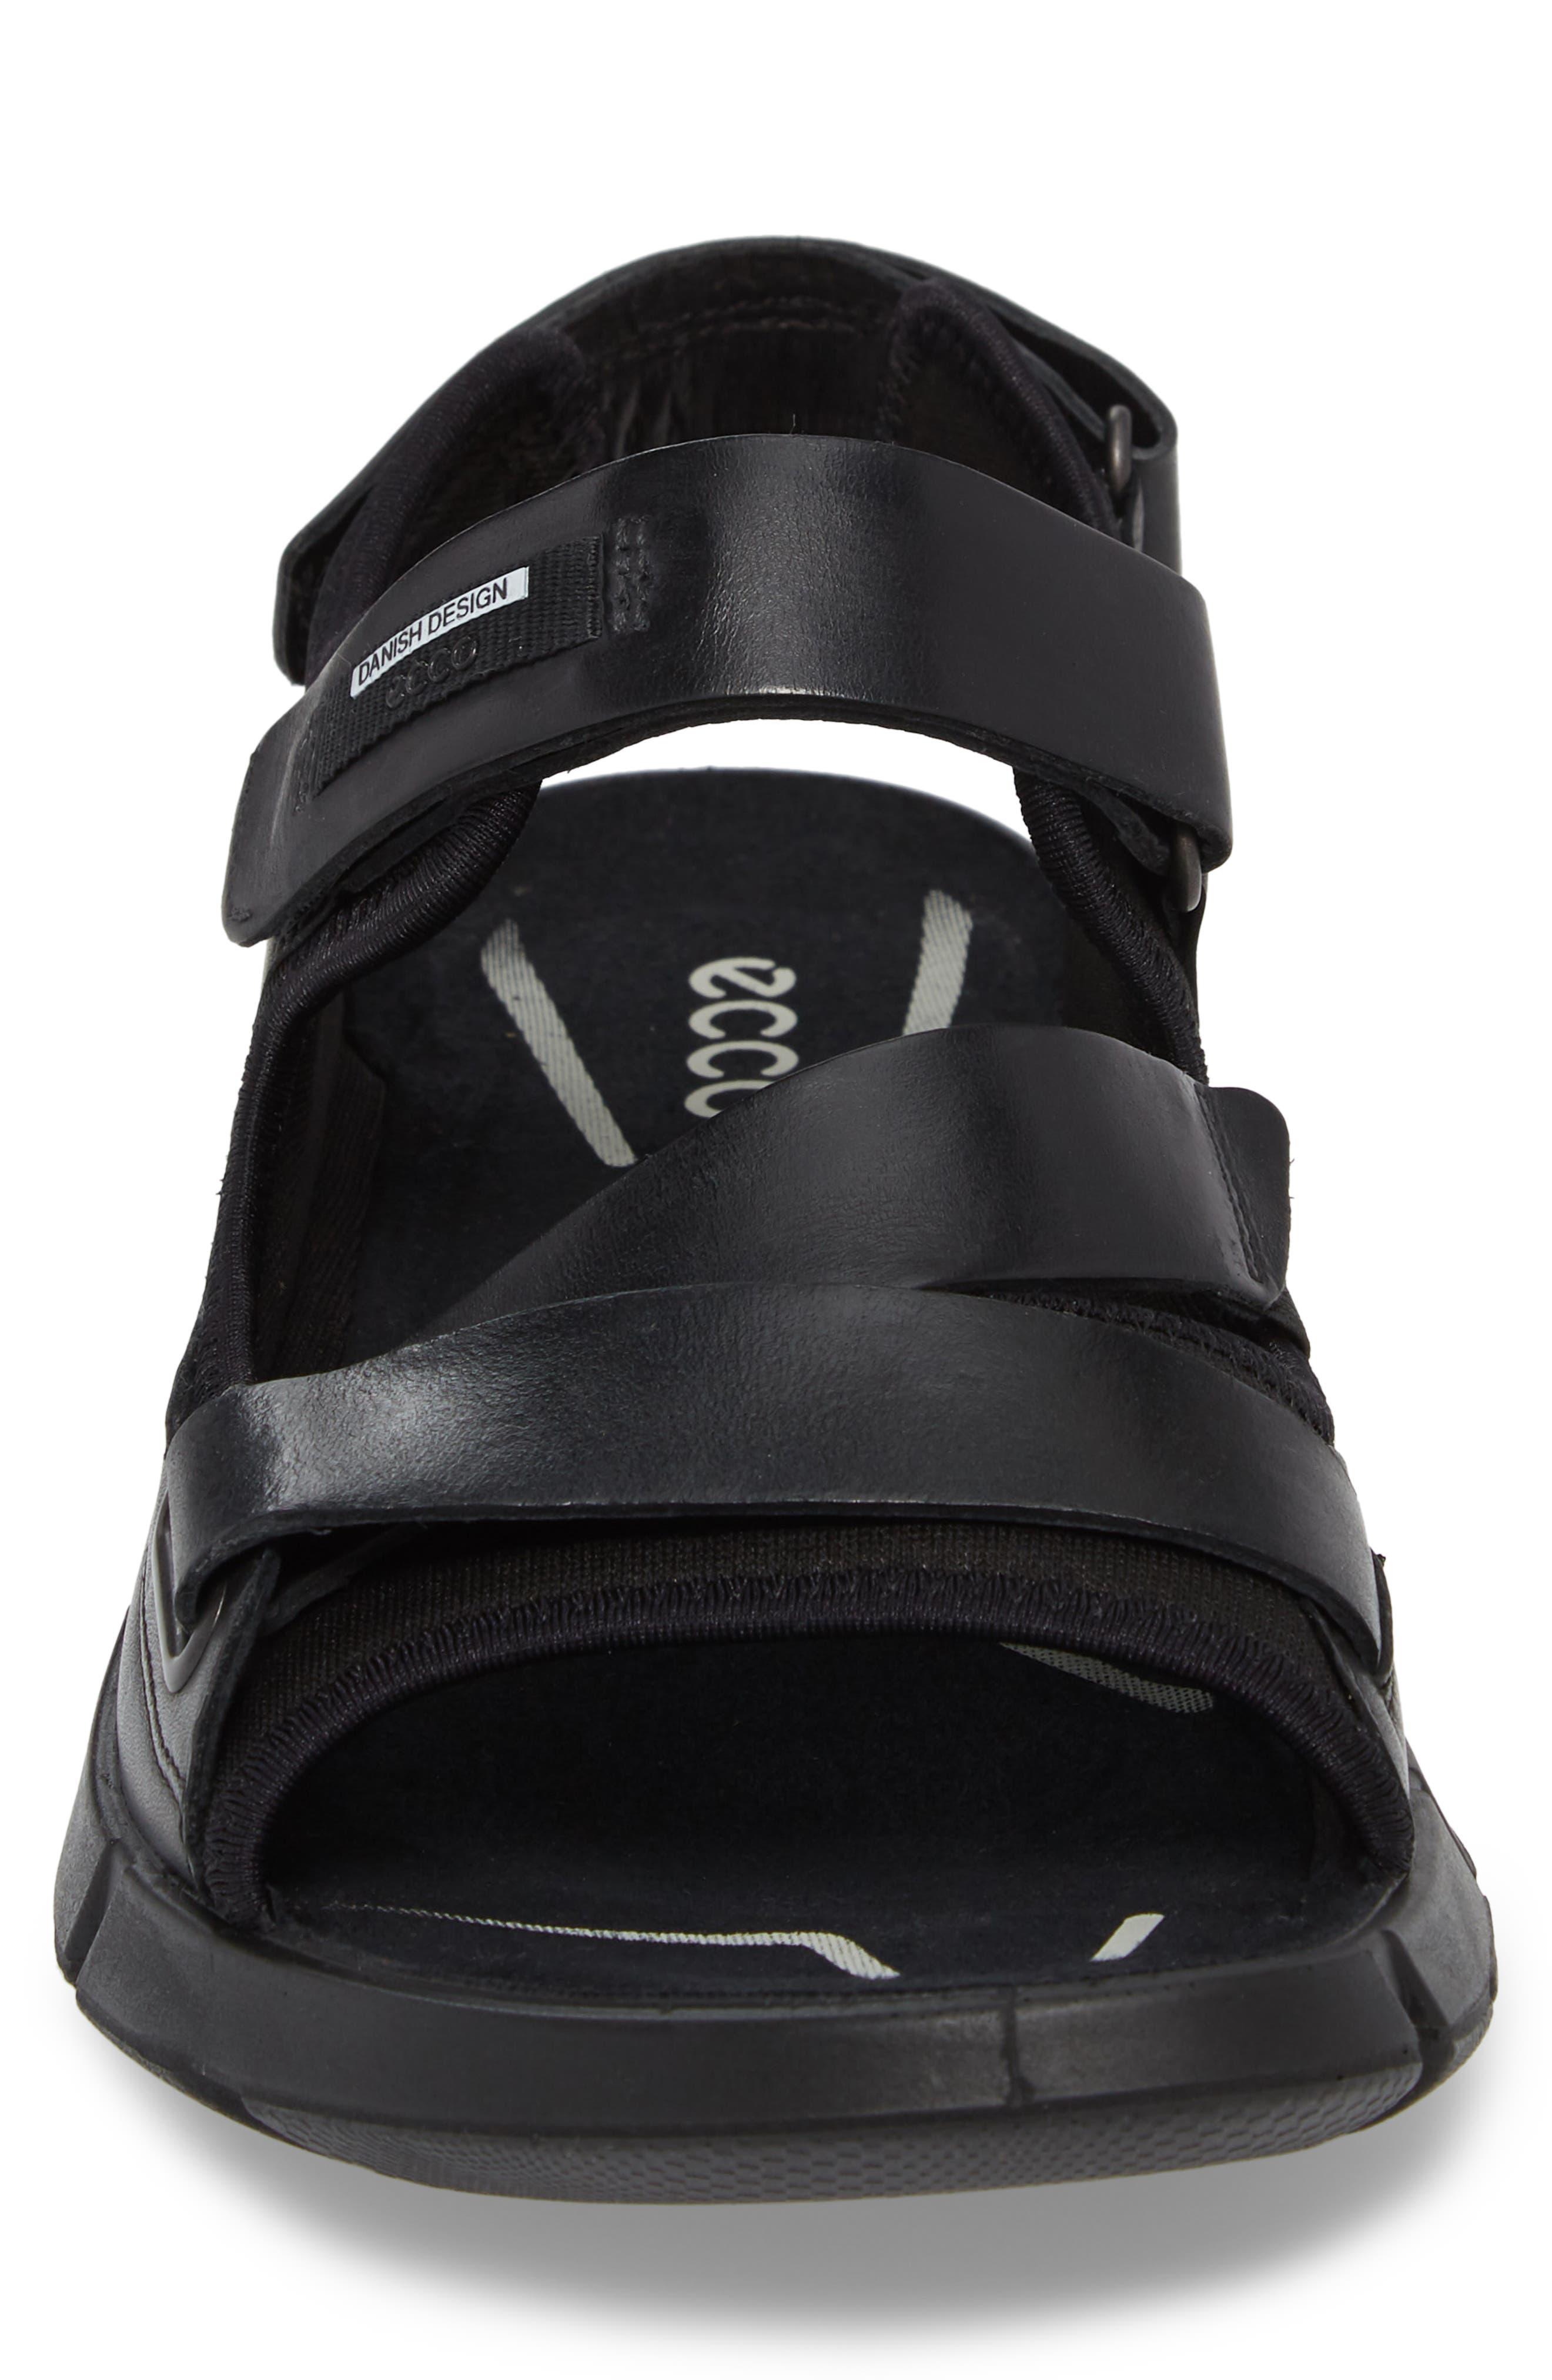 Intrinsic 2 Sandal,                             Alternate thumbnail 4, color,                             Black Leather